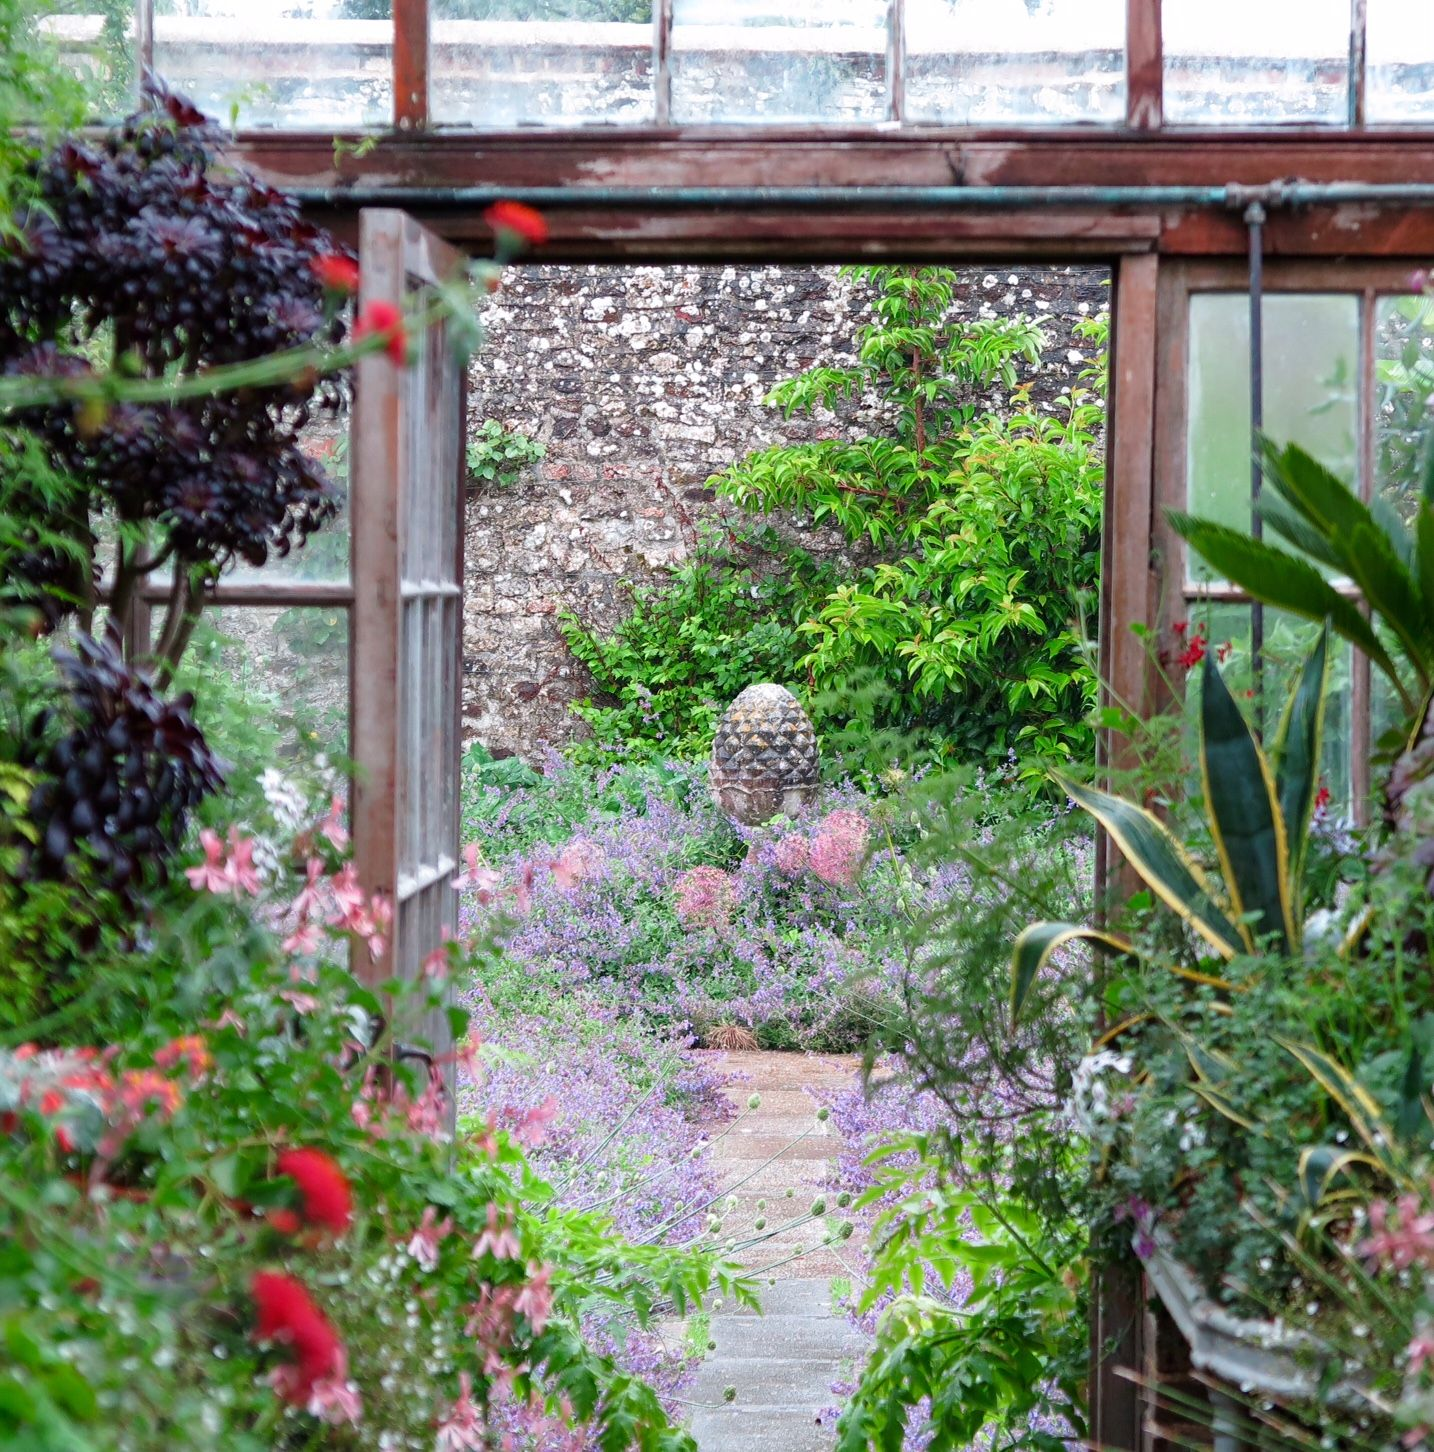 8 inspiring ideas from a stunning English country garden   English ...